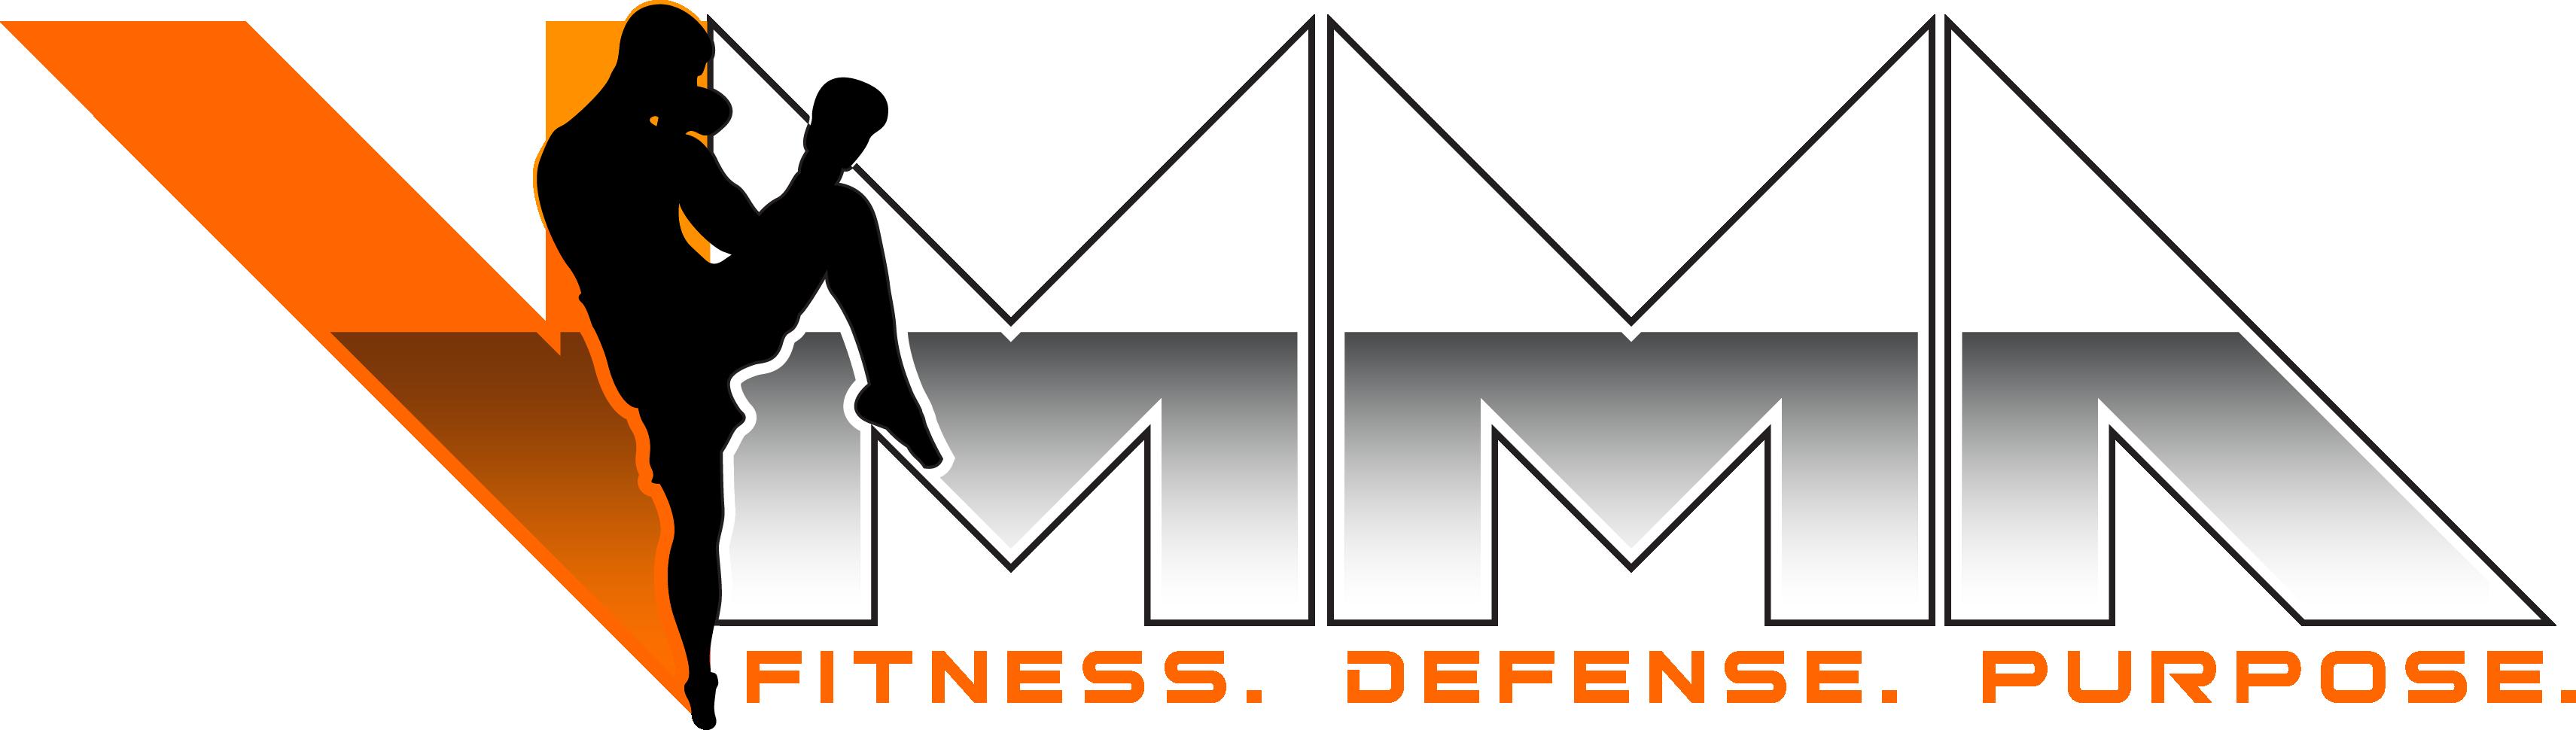 VMMA Doylestown - VIP Referral Form